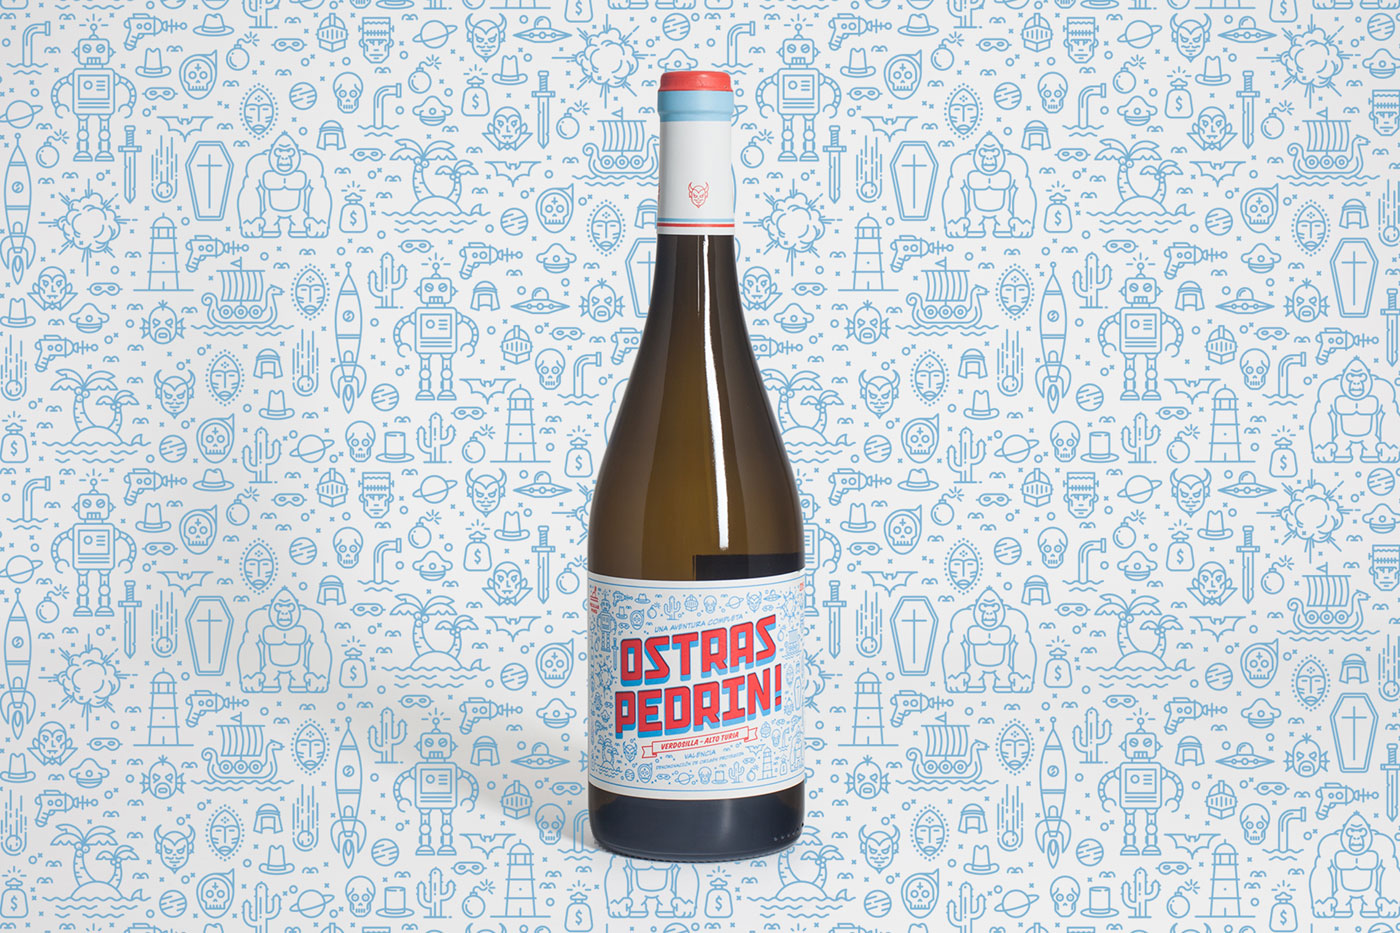 pixelarte-diseno-grafico-packaging-vino-Ostras_pedrin-Bodega-Vicente_Gandia